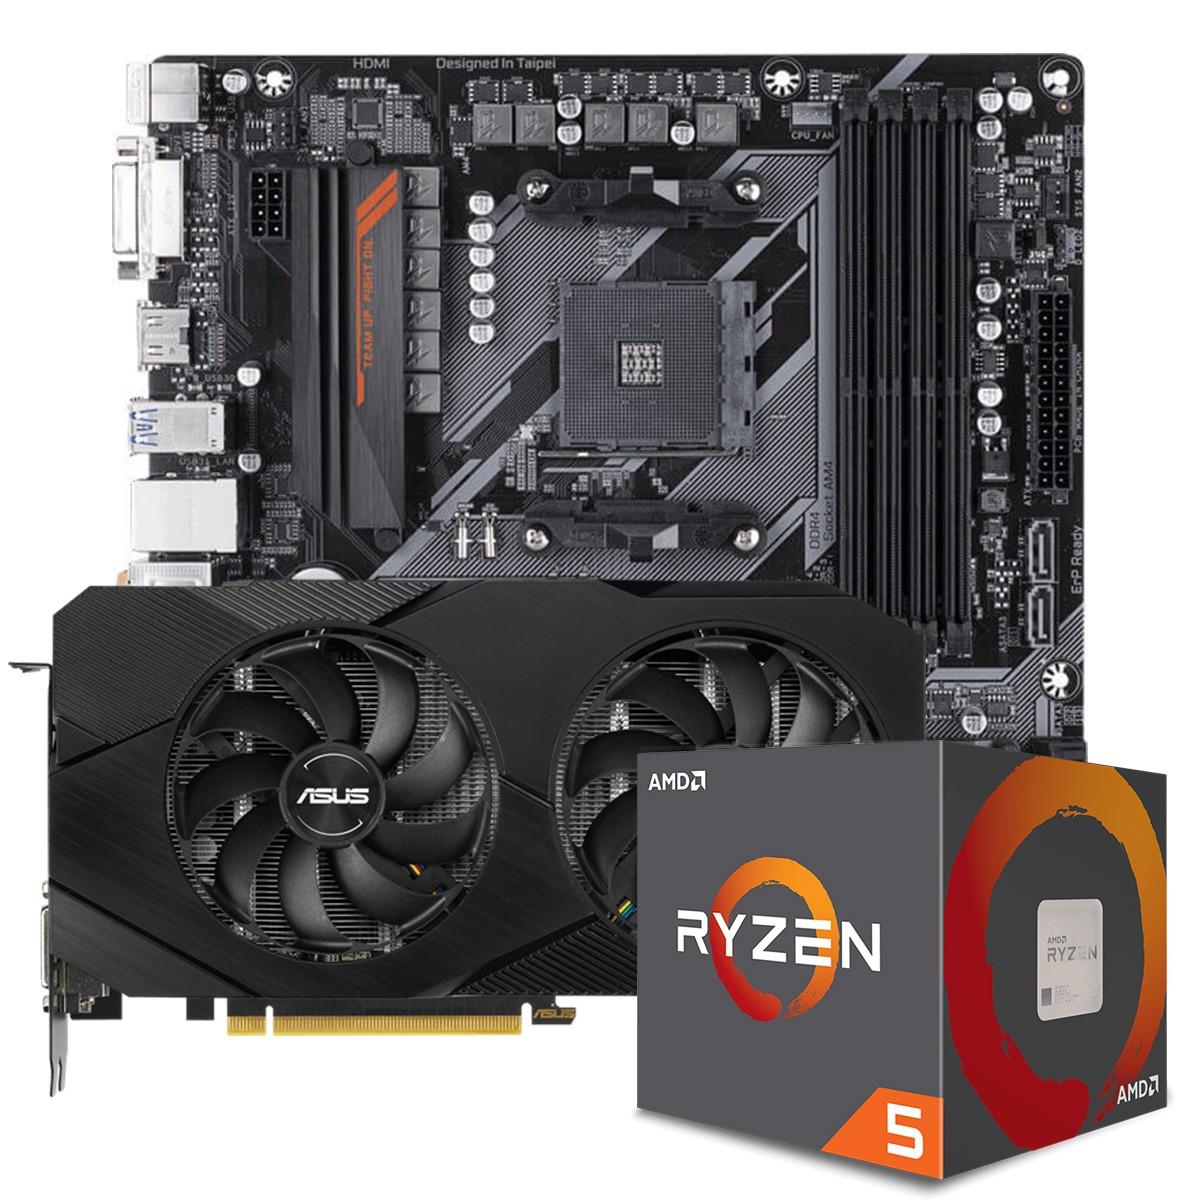 Kit Upgrade ASUS GeForce RTX 2060 OC EVO Dual + AMD Ryzen 5 5600X + Gigabyte B450 AORUS M